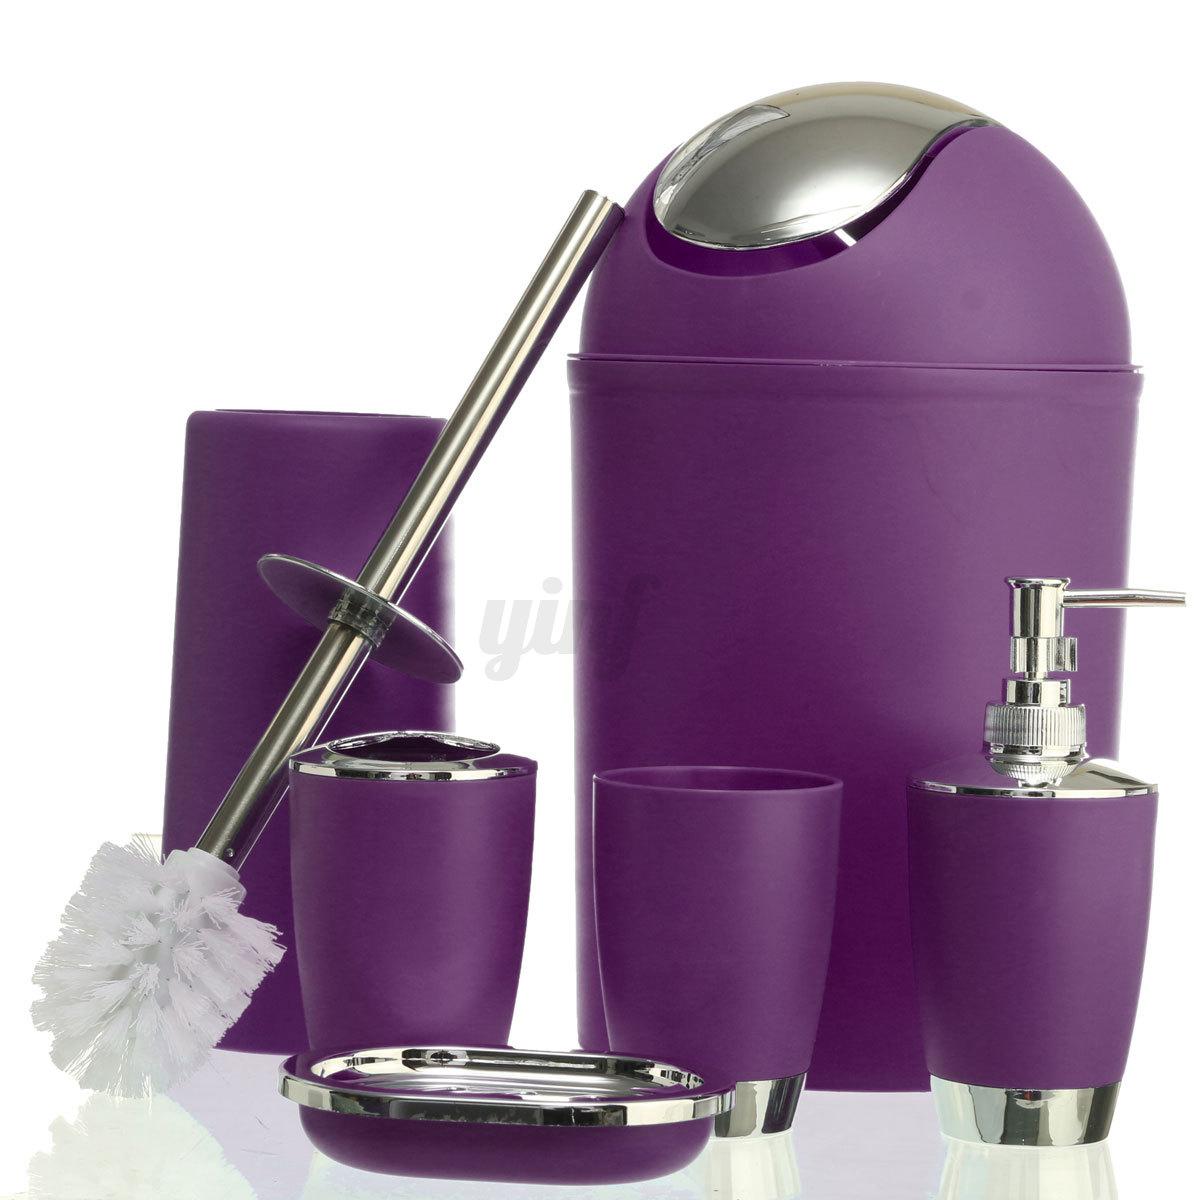 Purple Bathroom Bin 6pcs Bathroom Accessory Set Soap Dish Dispenser Bin Tumbler